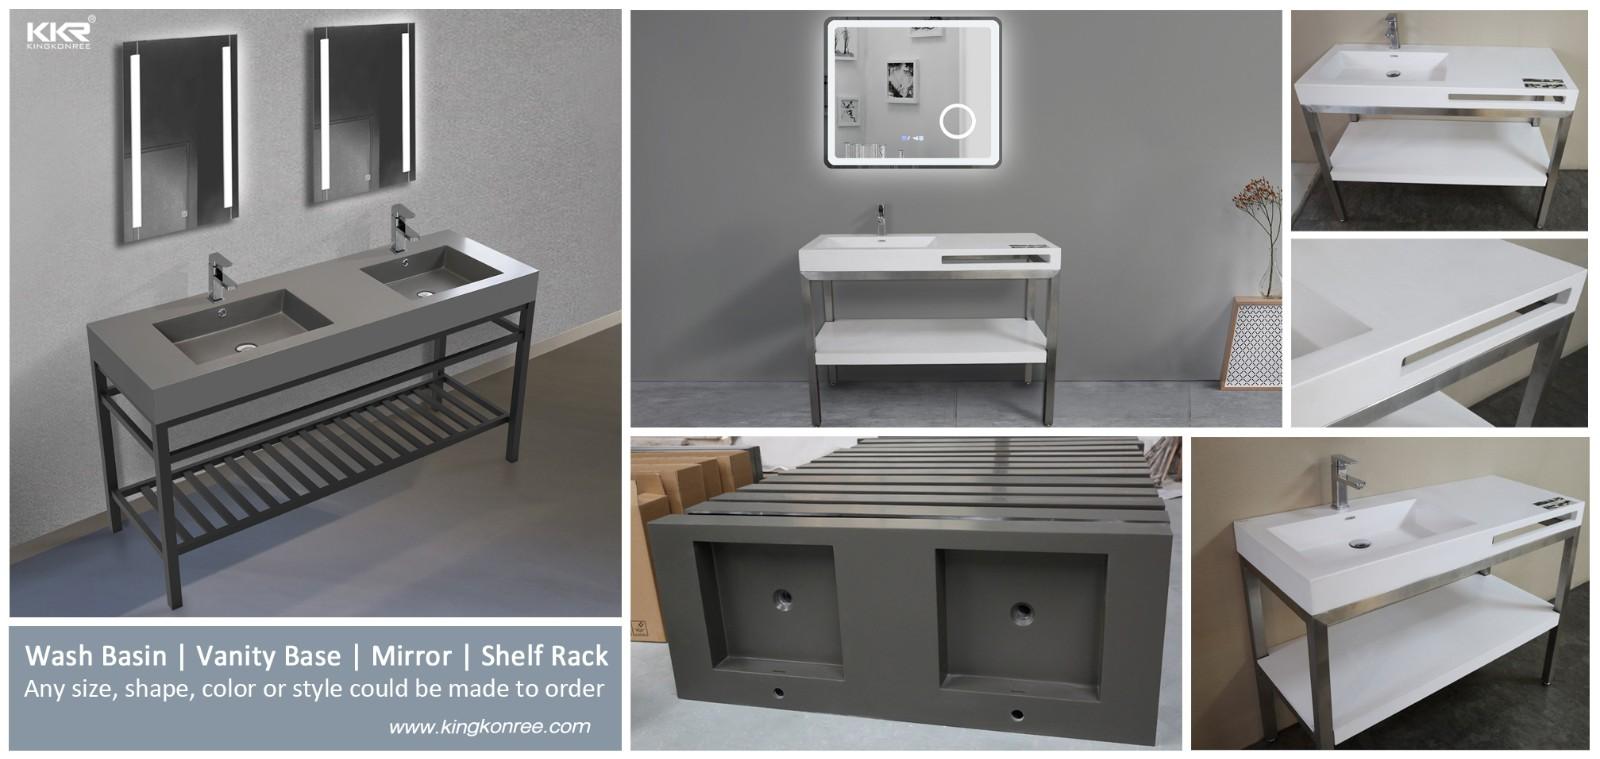 KingKonree solid stone countertops manufacturer for bathroom-1